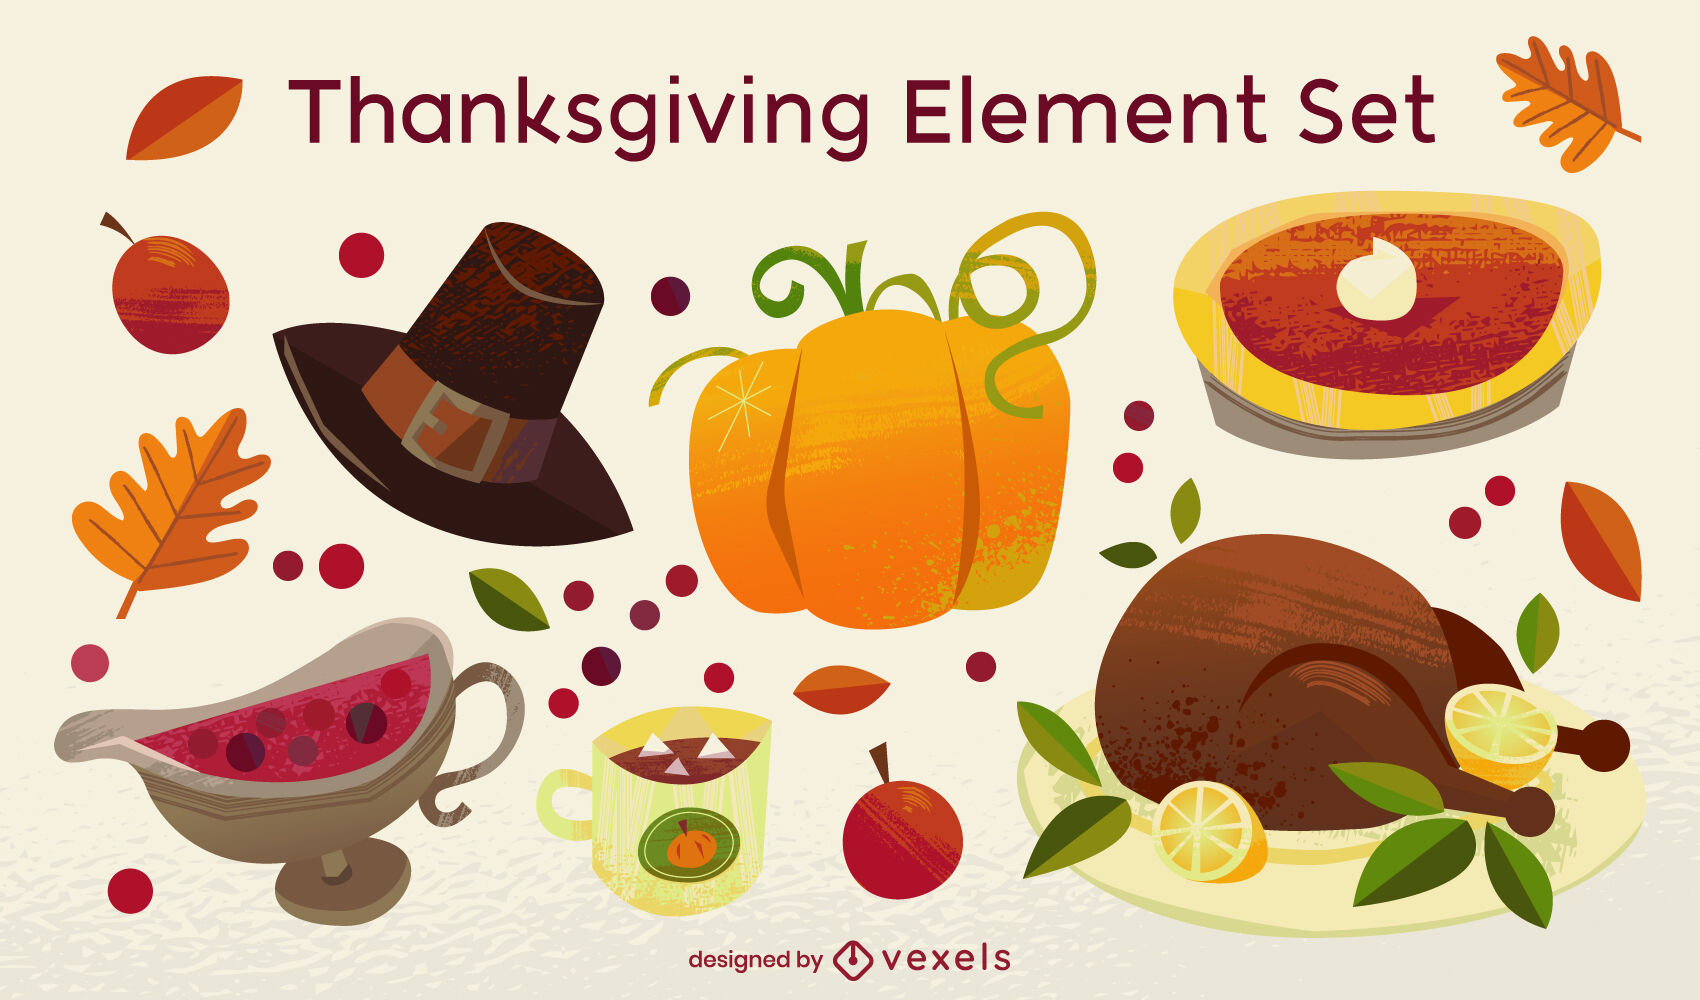 Thanksgiving holiday food element set